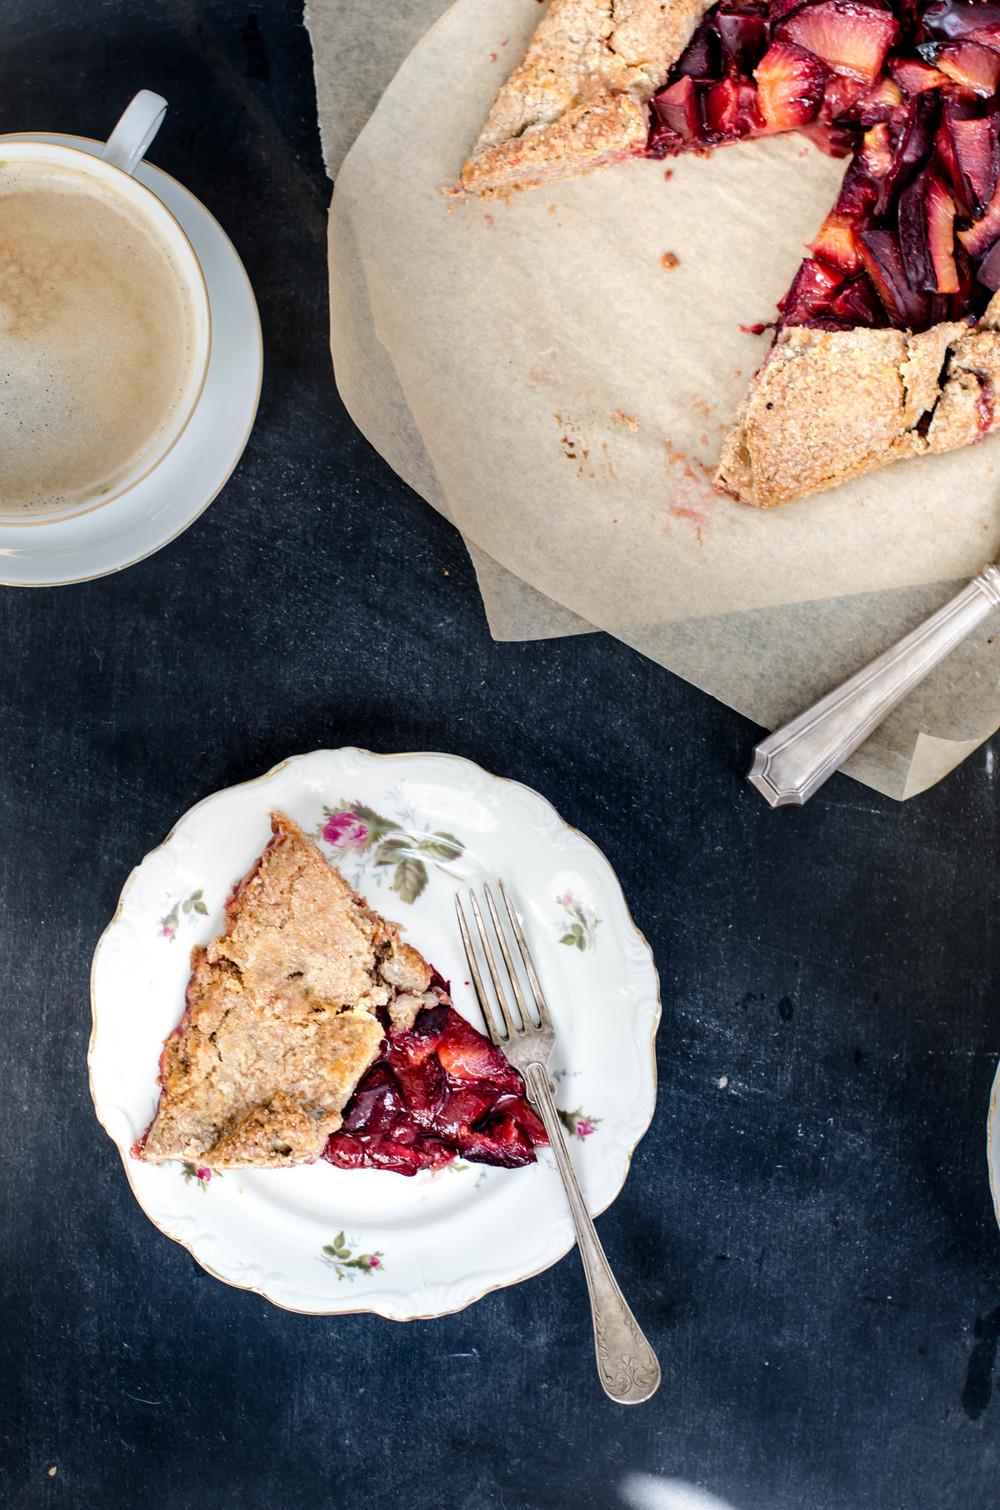 ROSE & IVY Journal Plum Crostada with Cinnamon Rye Crust